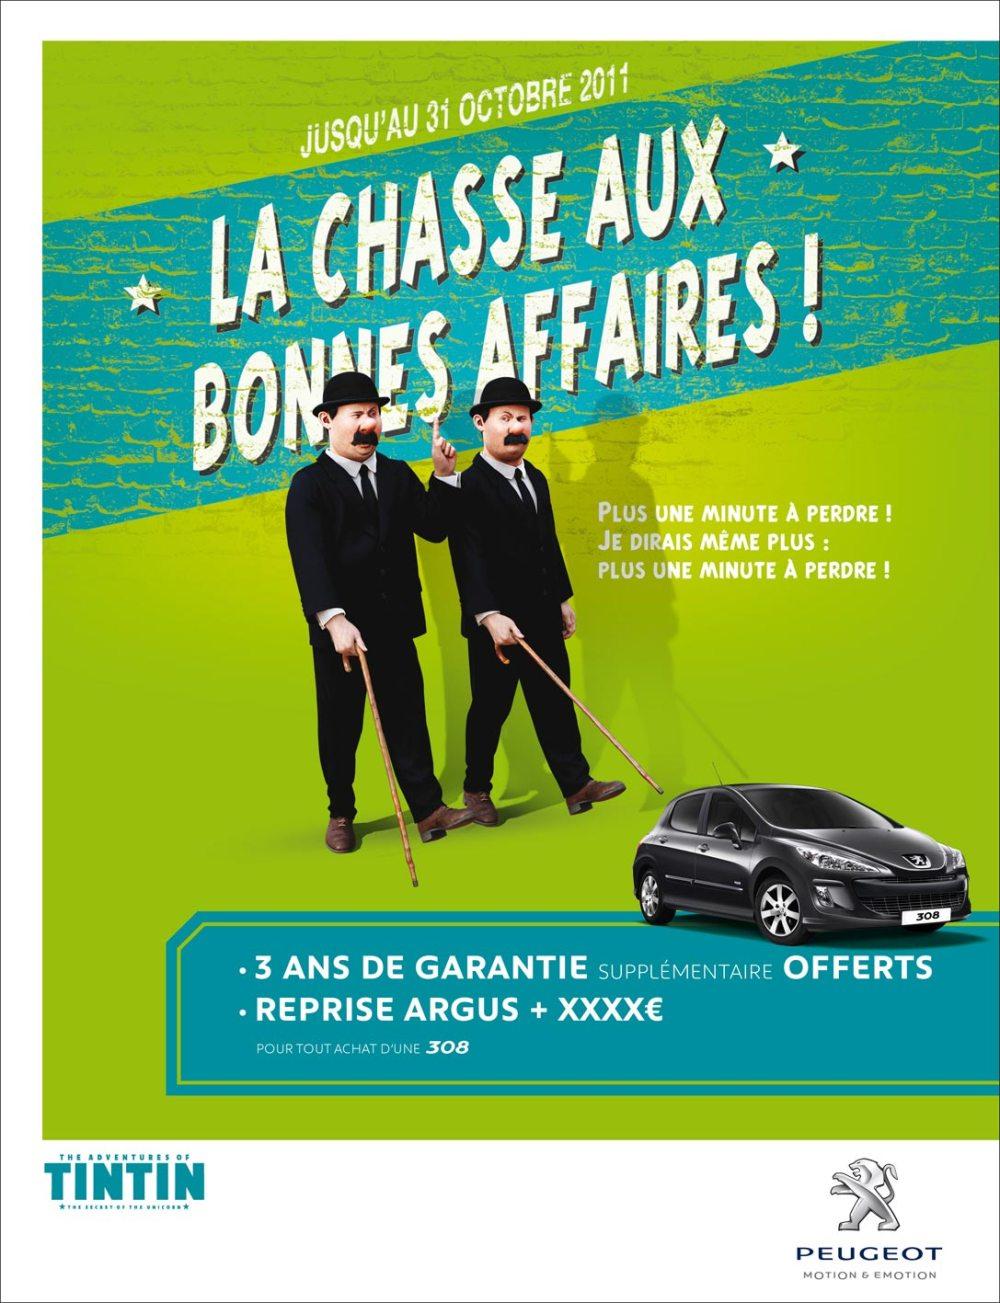 Peugeot Event Tintin 1